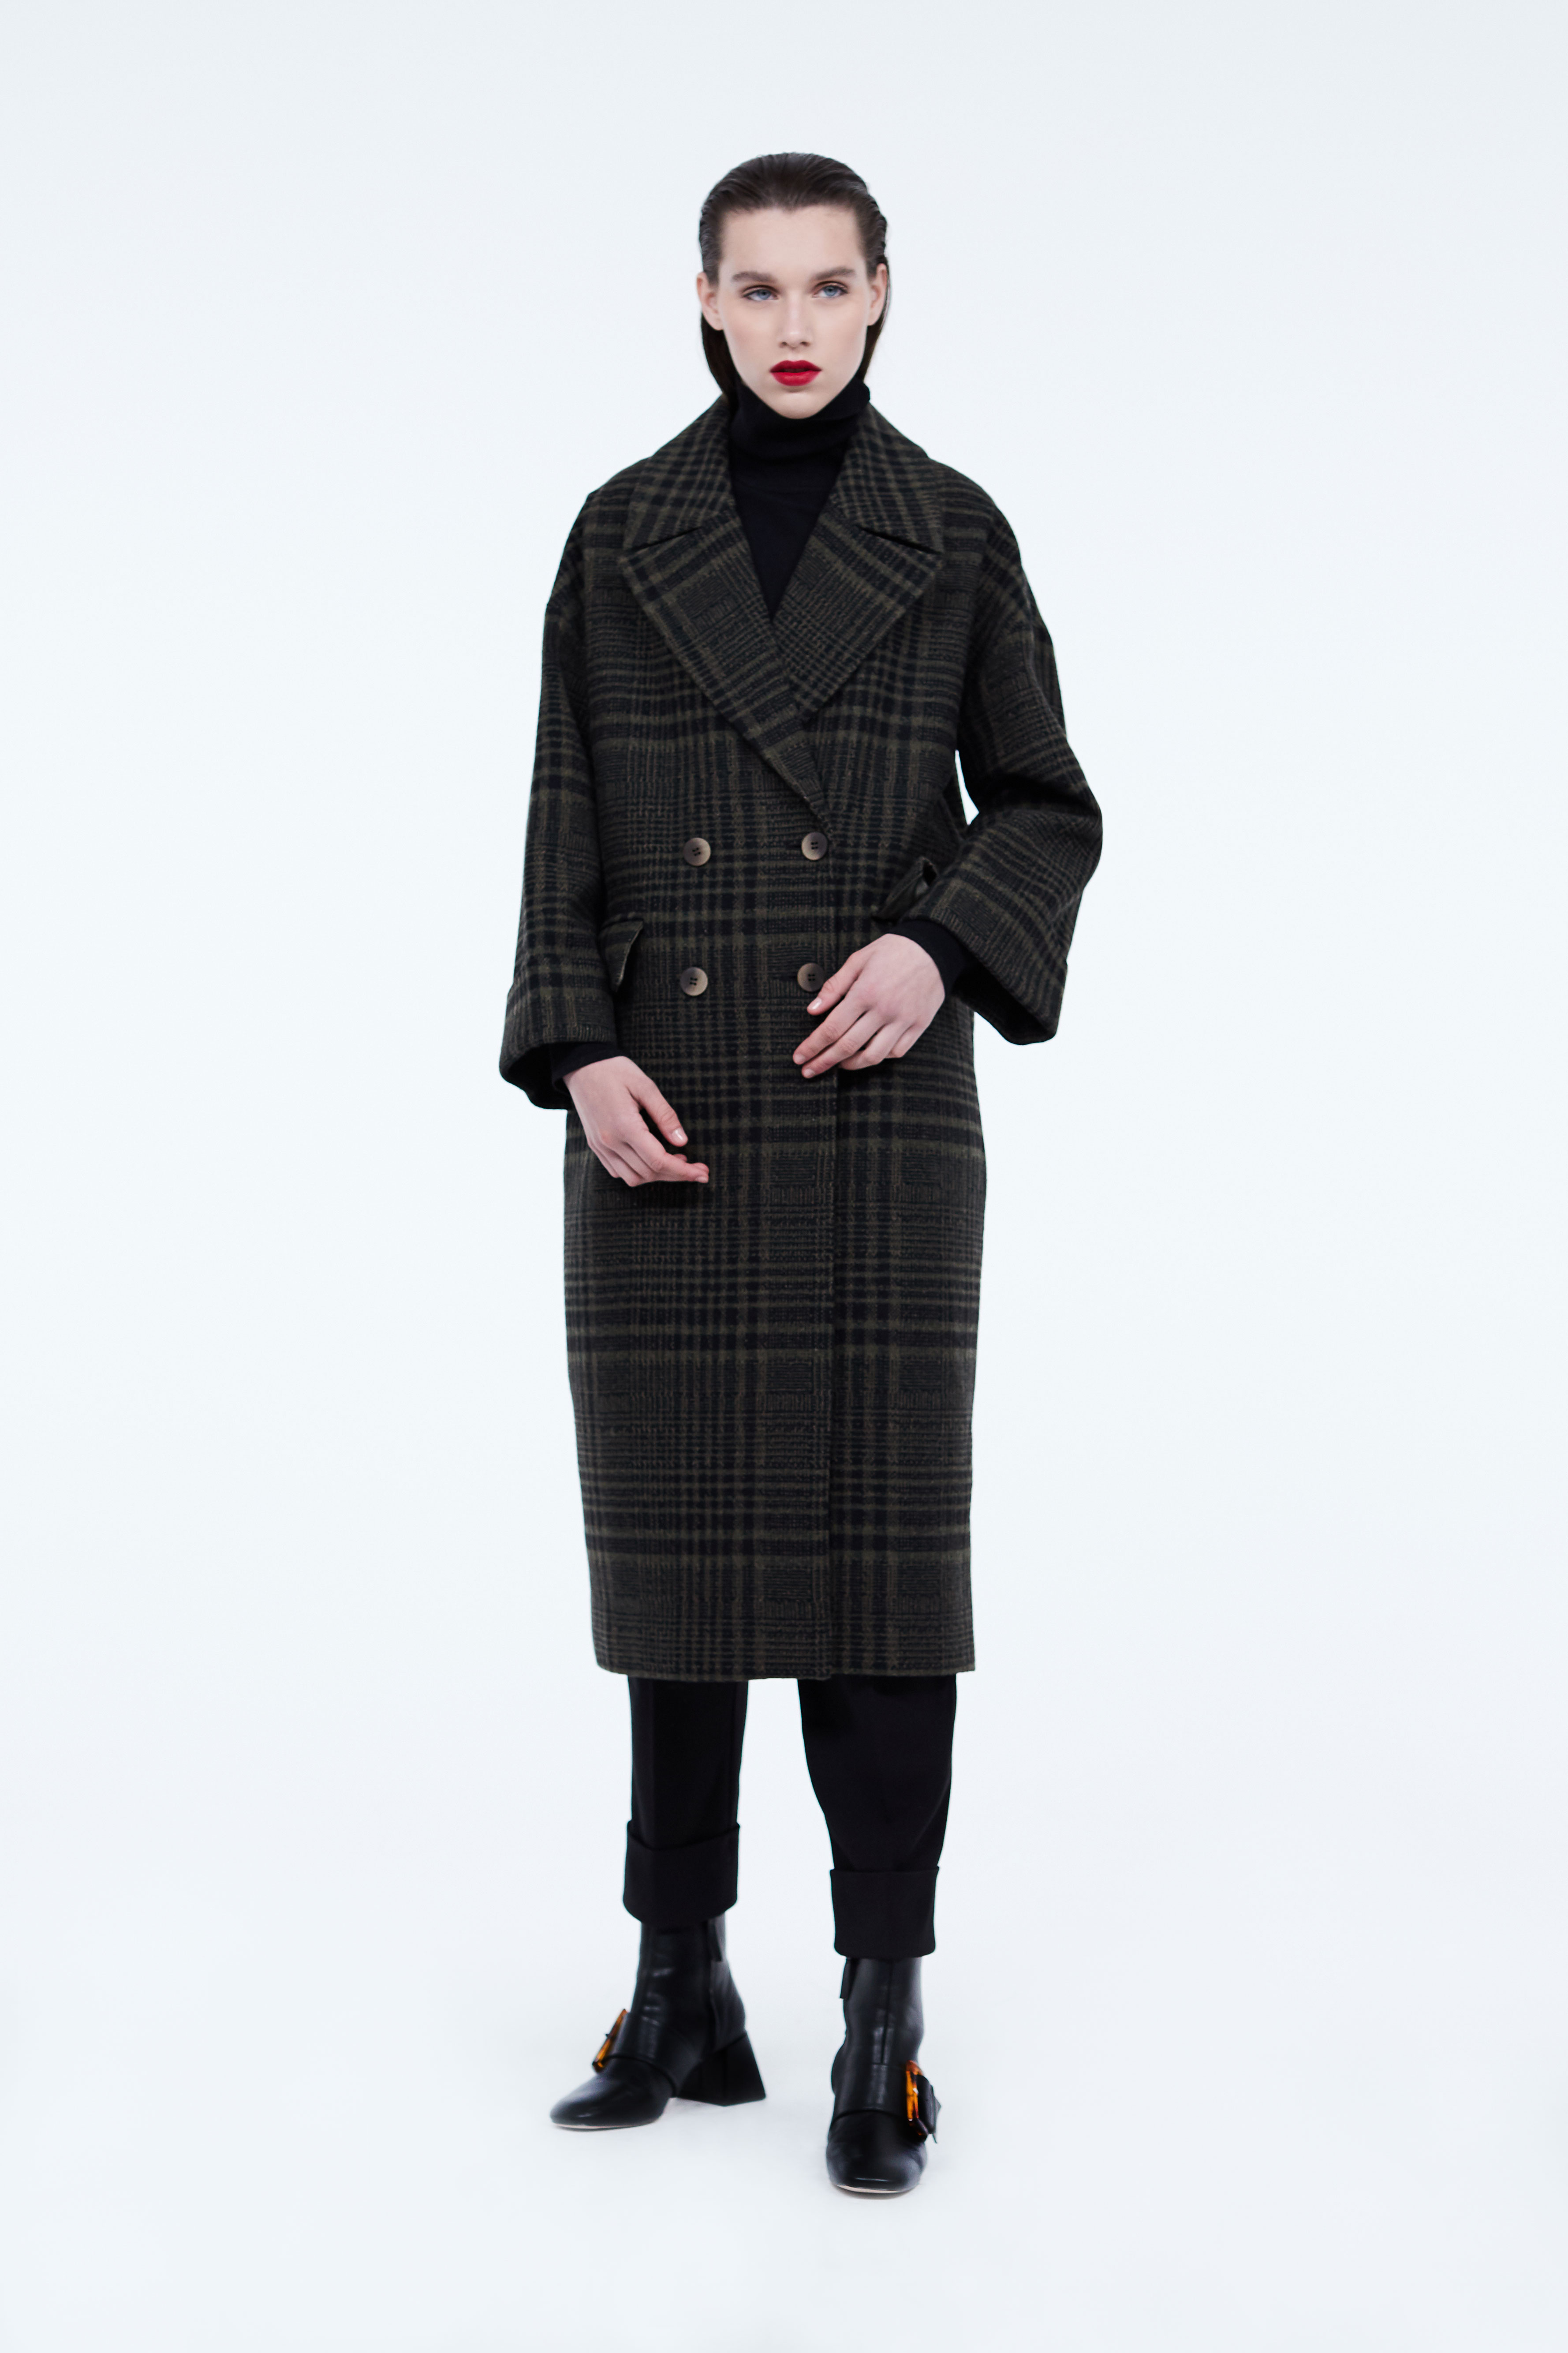 Полупальто LIME Пальто с карманами